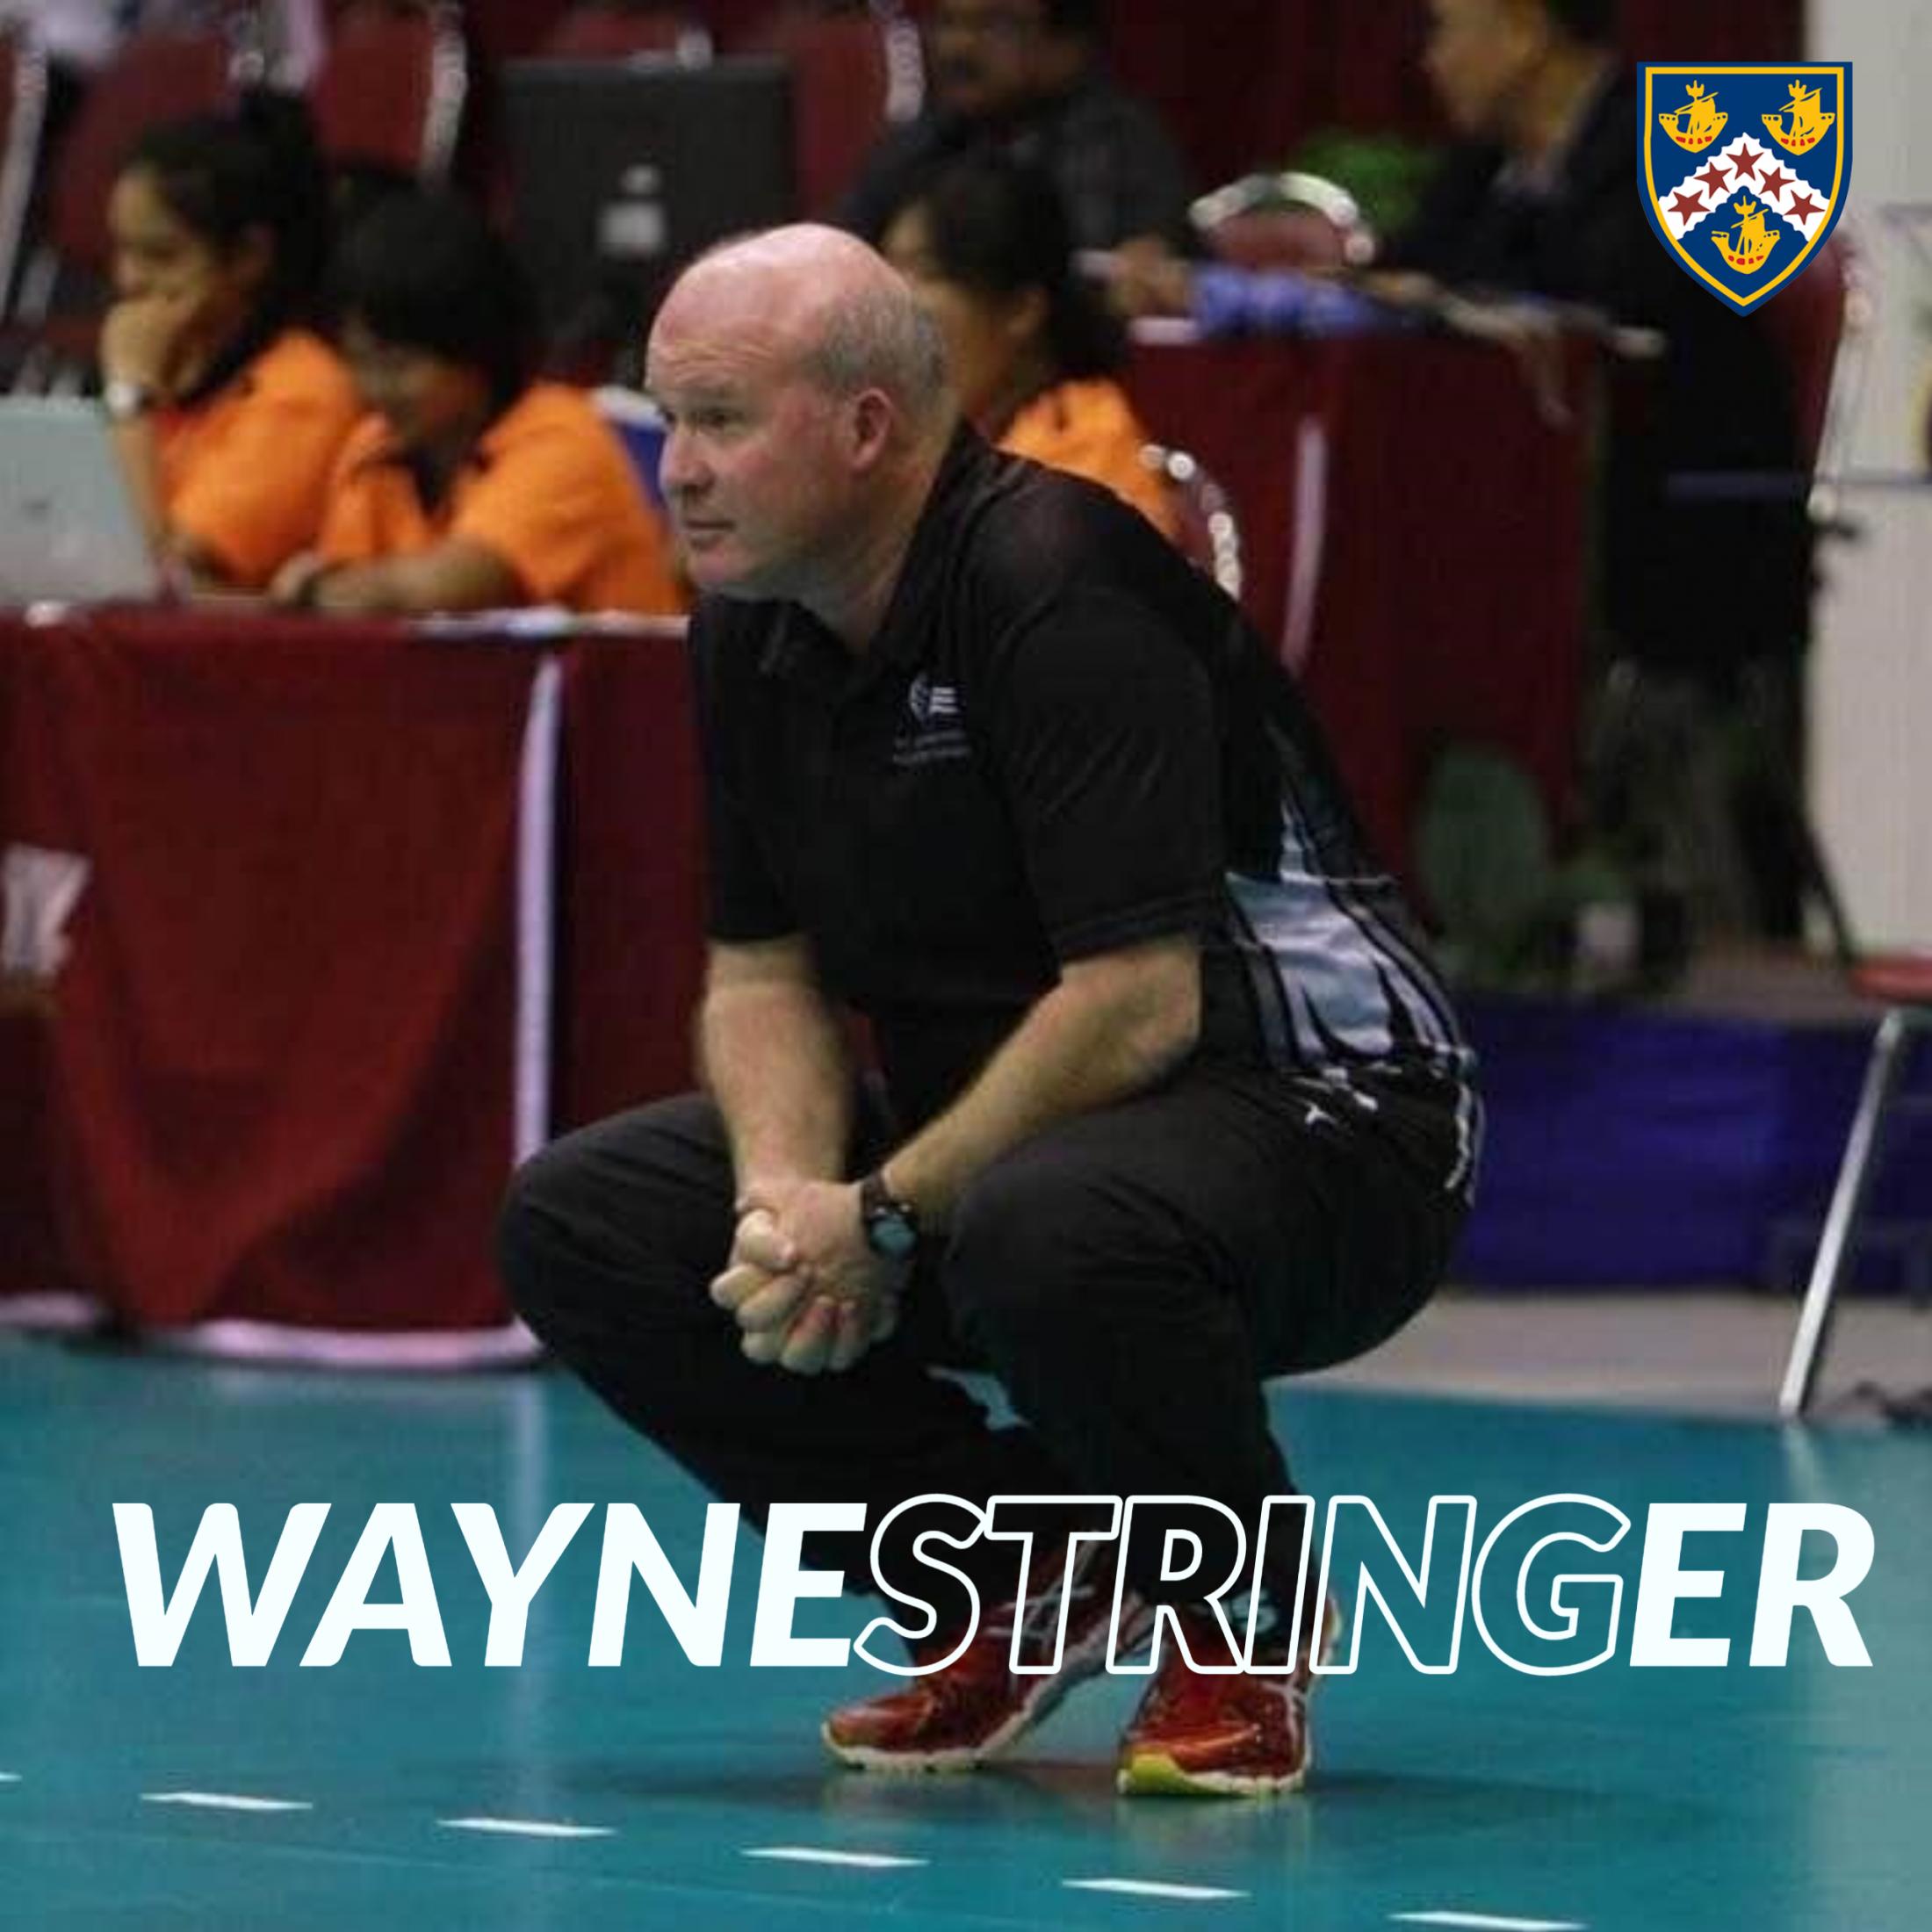 Wayne Stringer